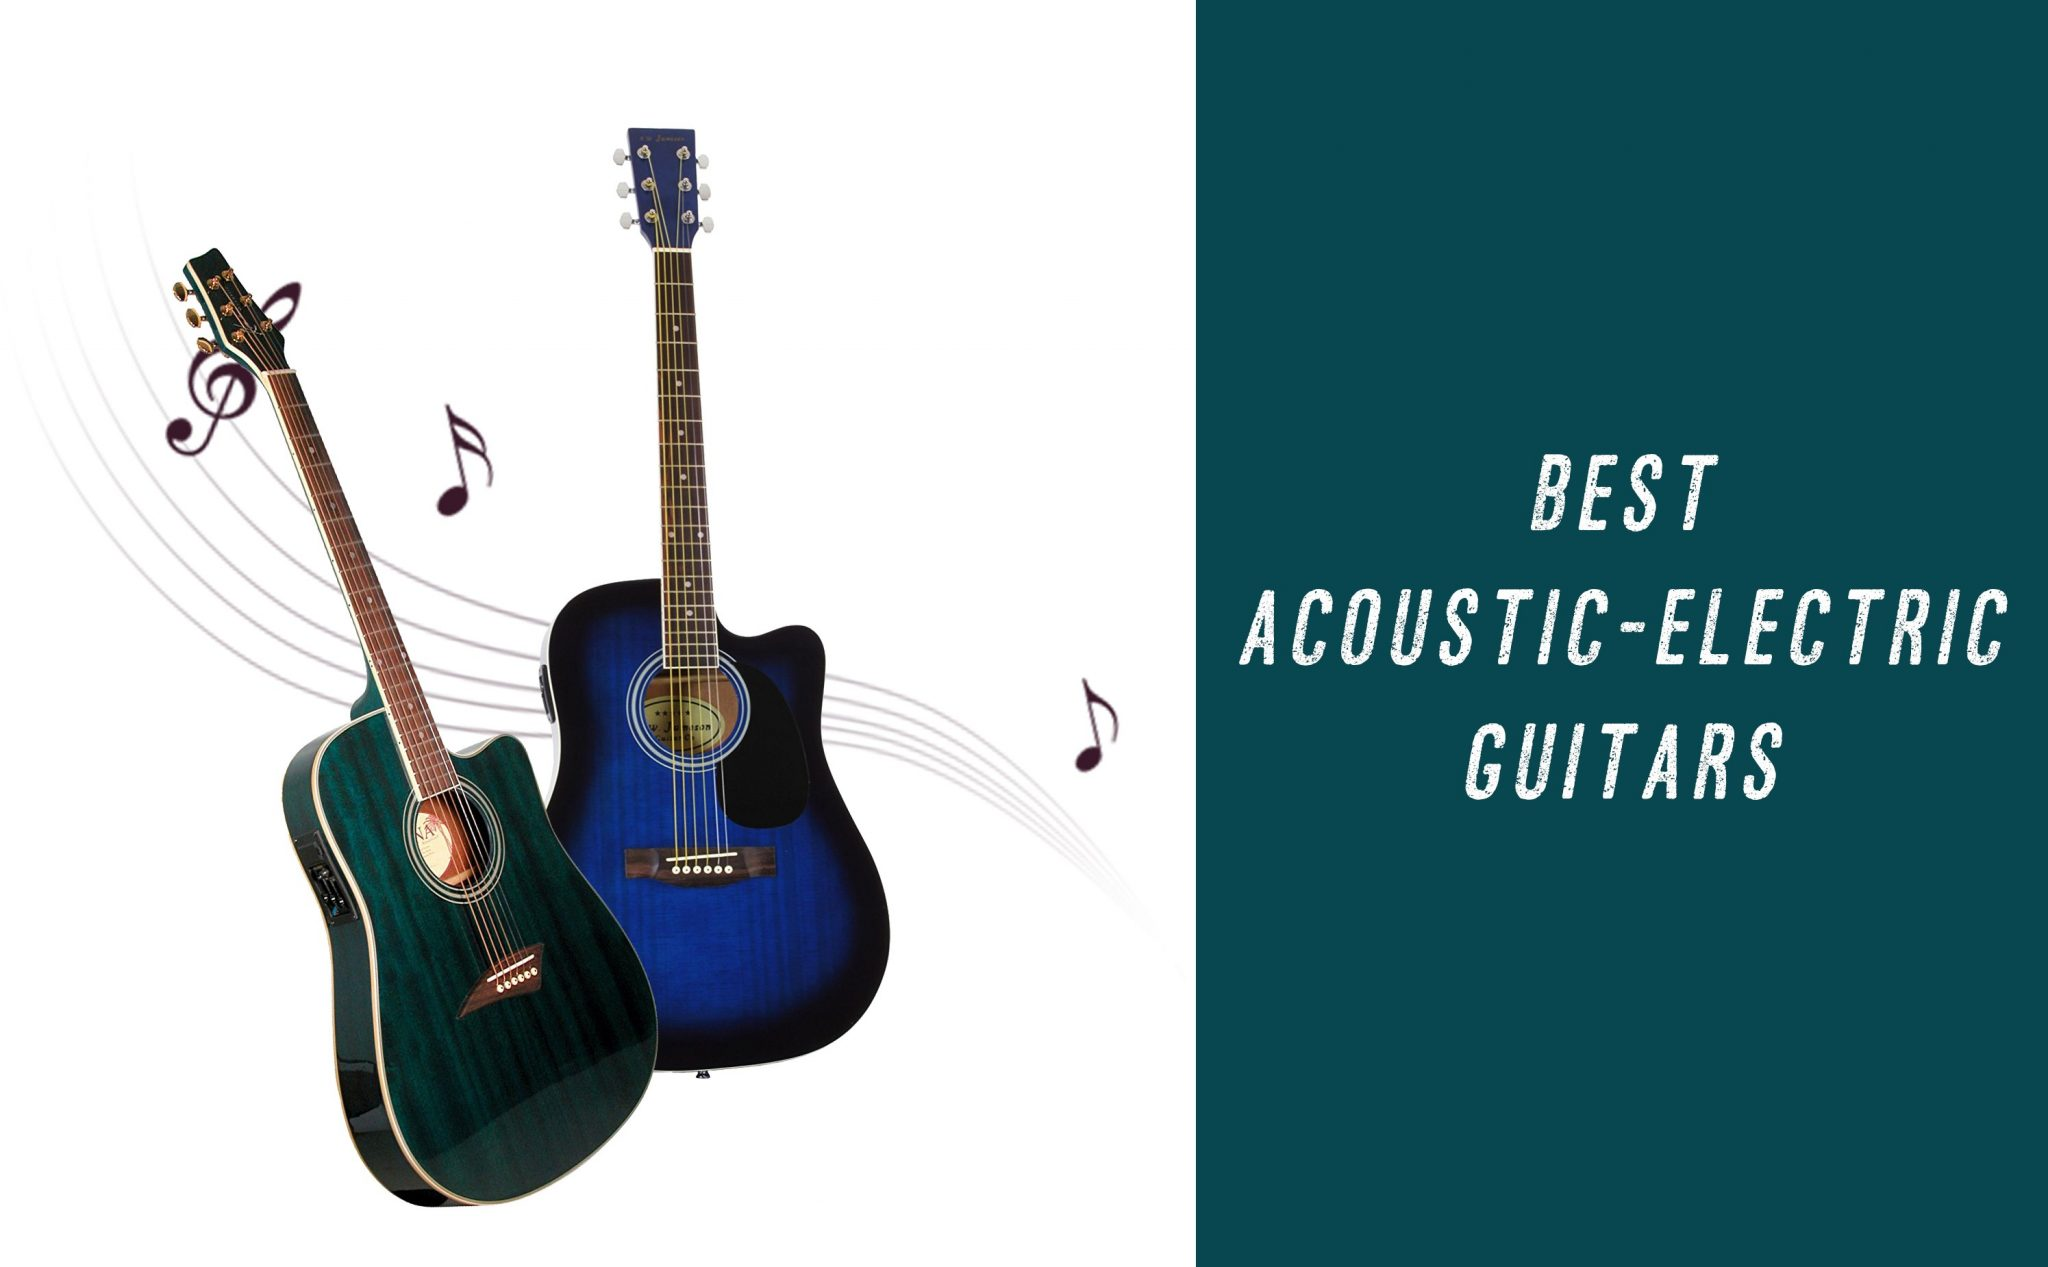 Best Acoustic-electric Guitars